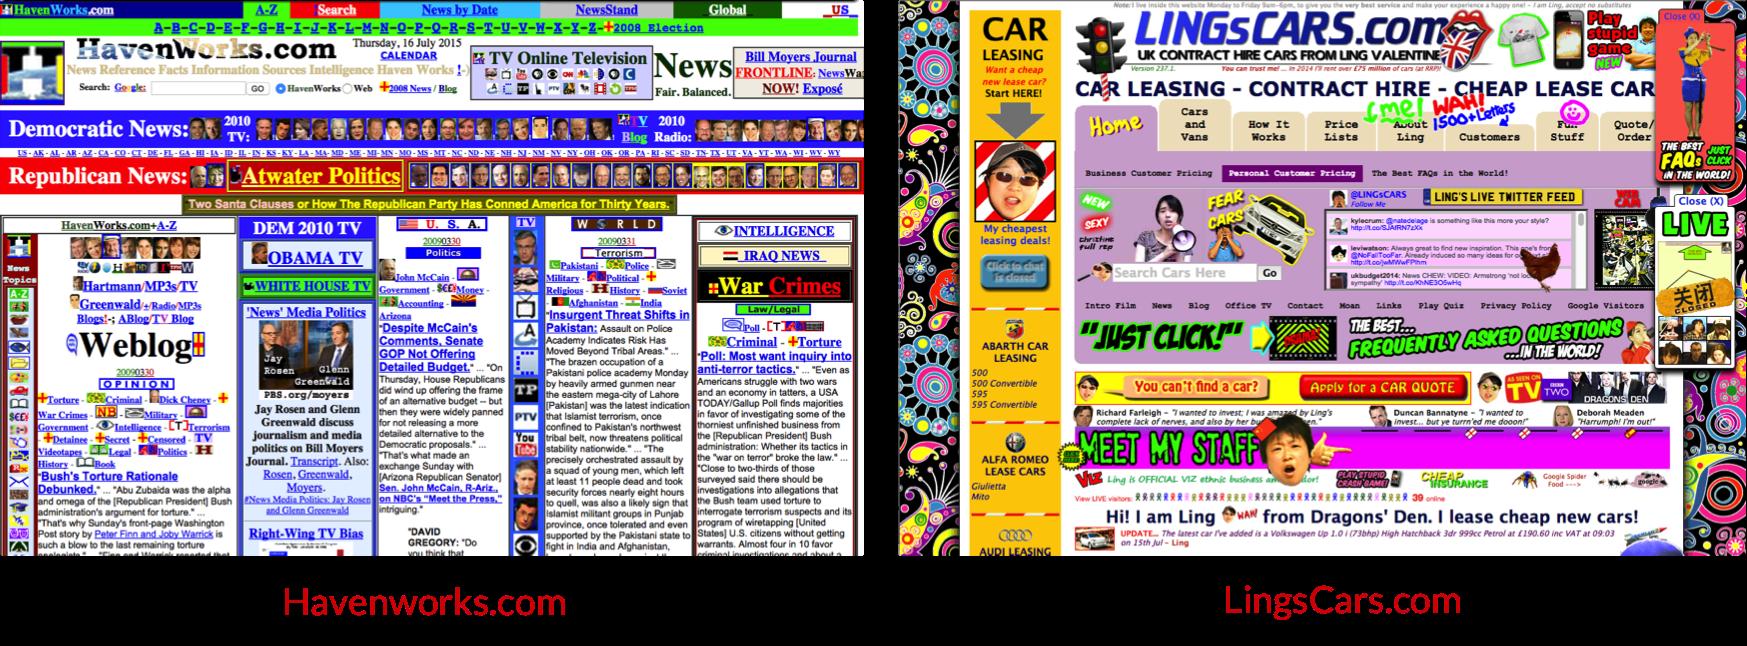 bad_web_design